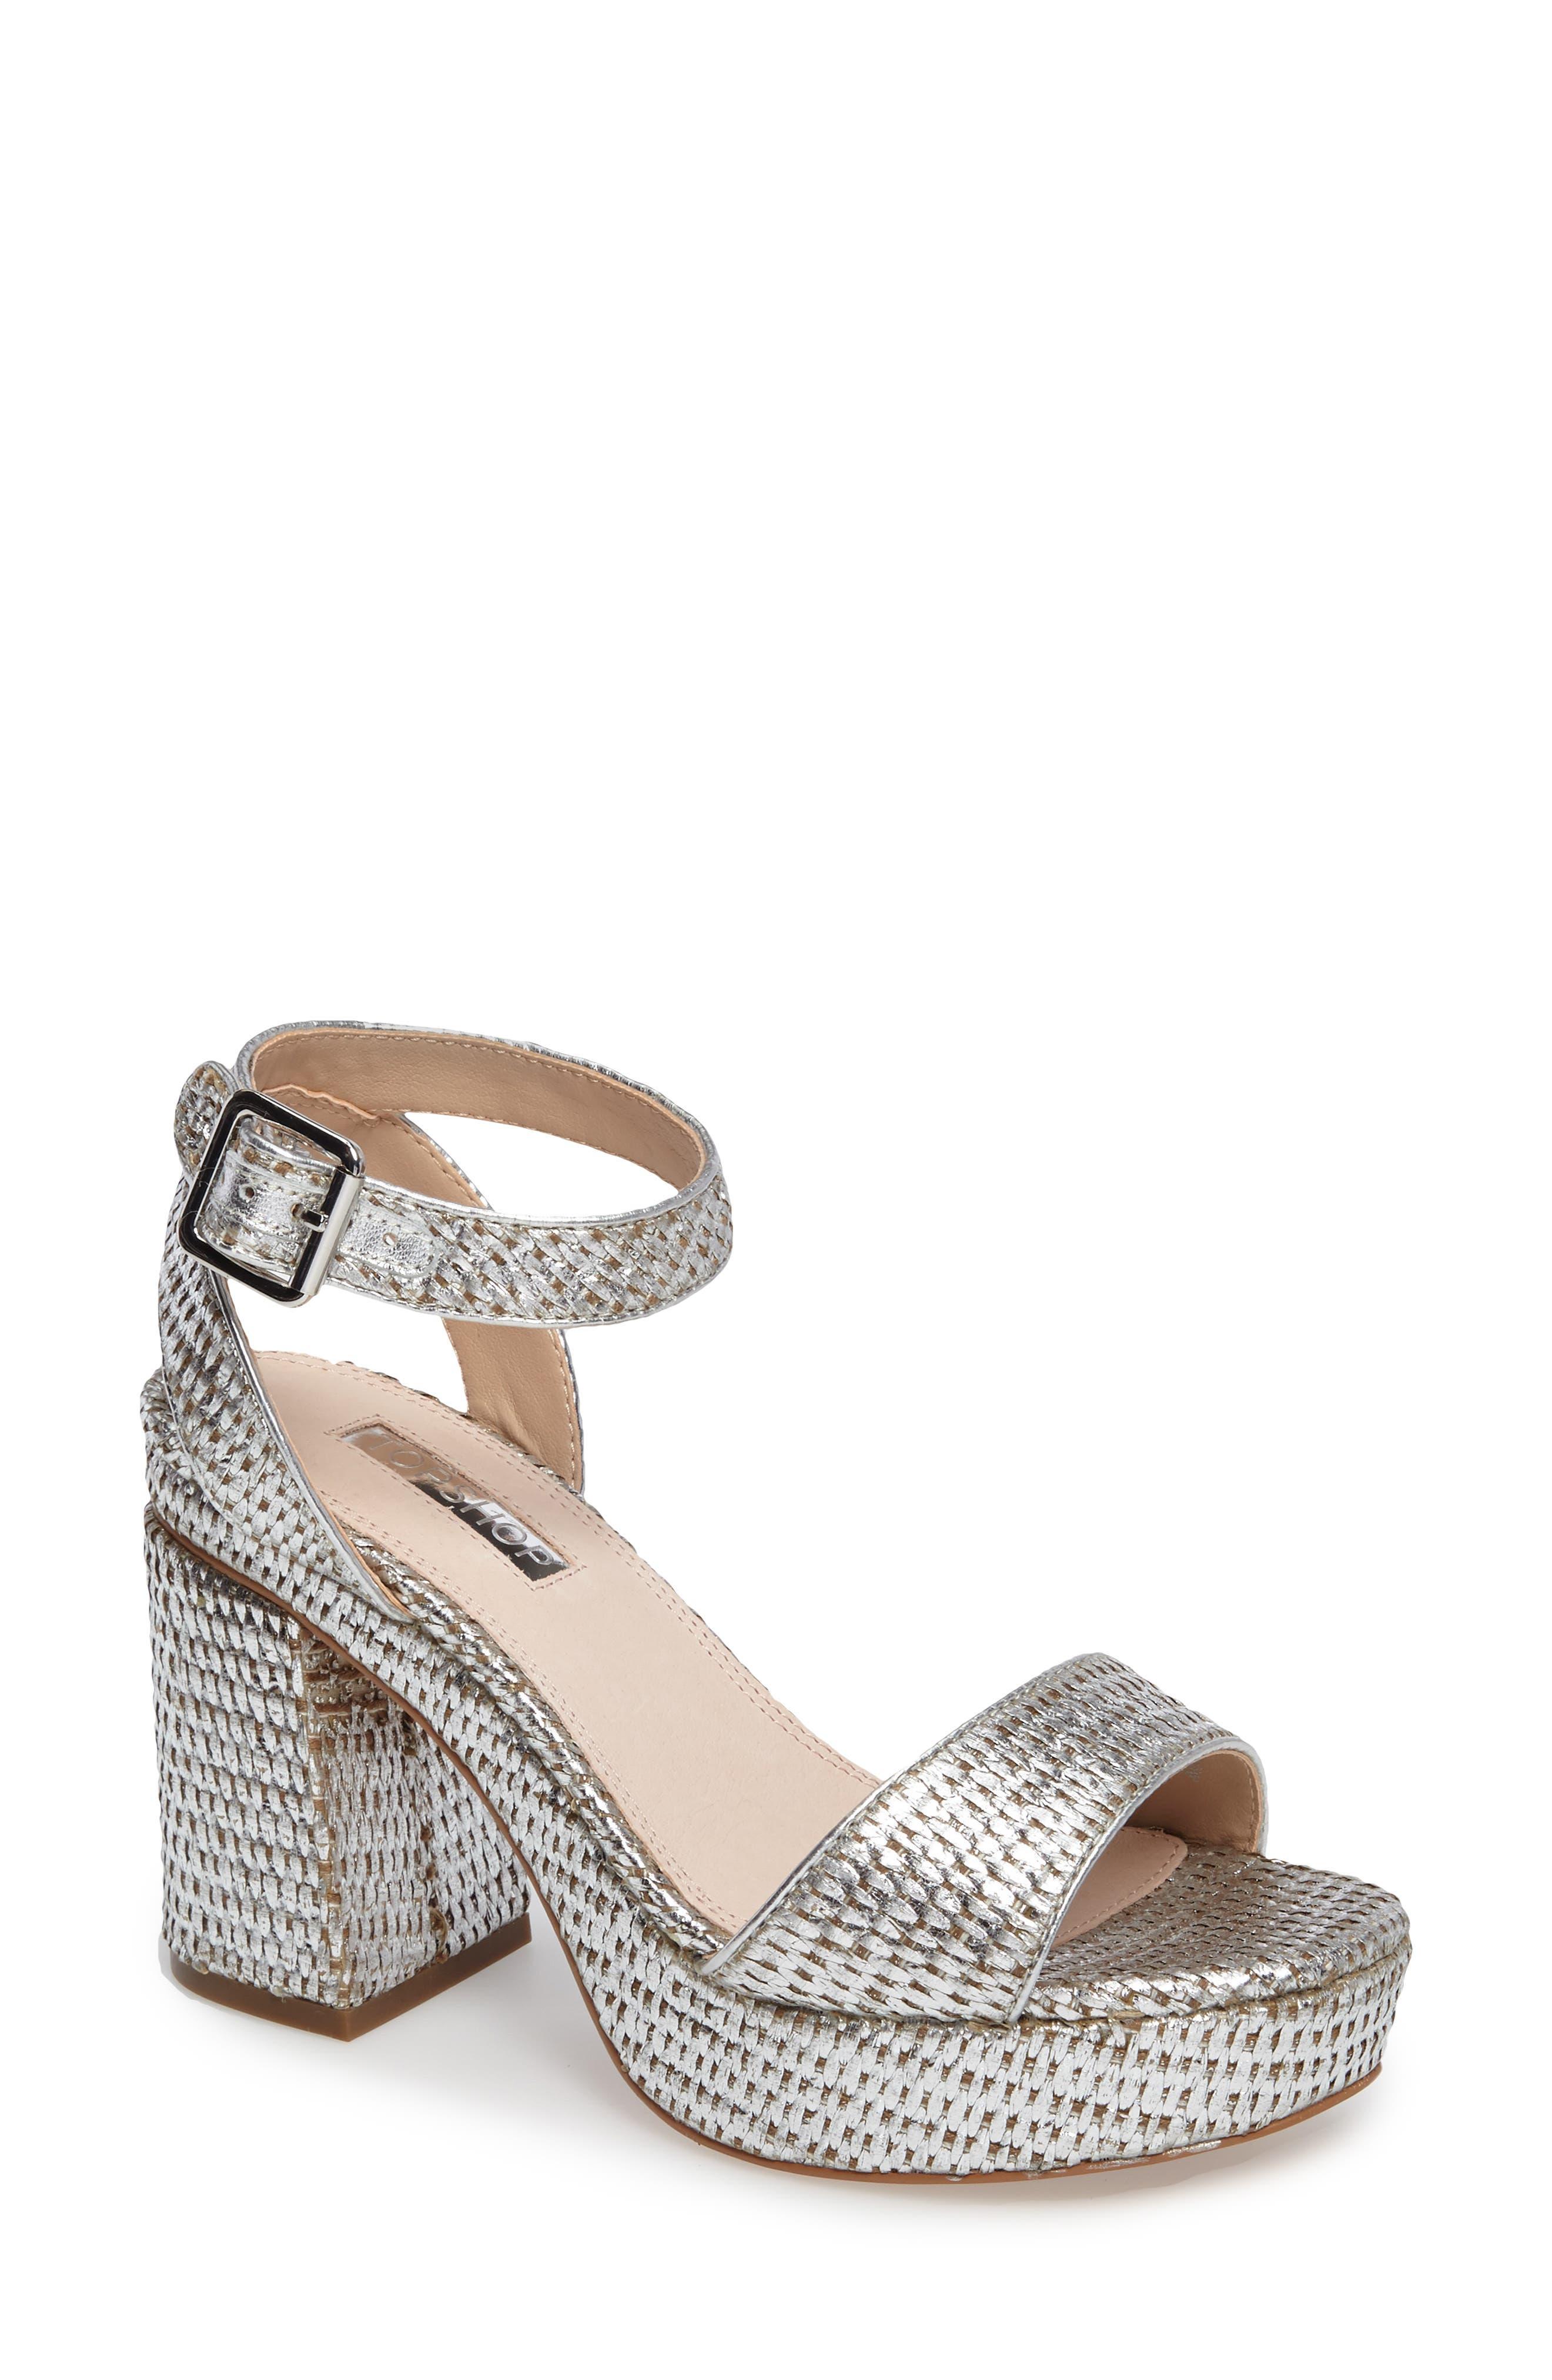 Alternate Image 1 Selected - Topshop Love Woven Platform Sandal (Women)